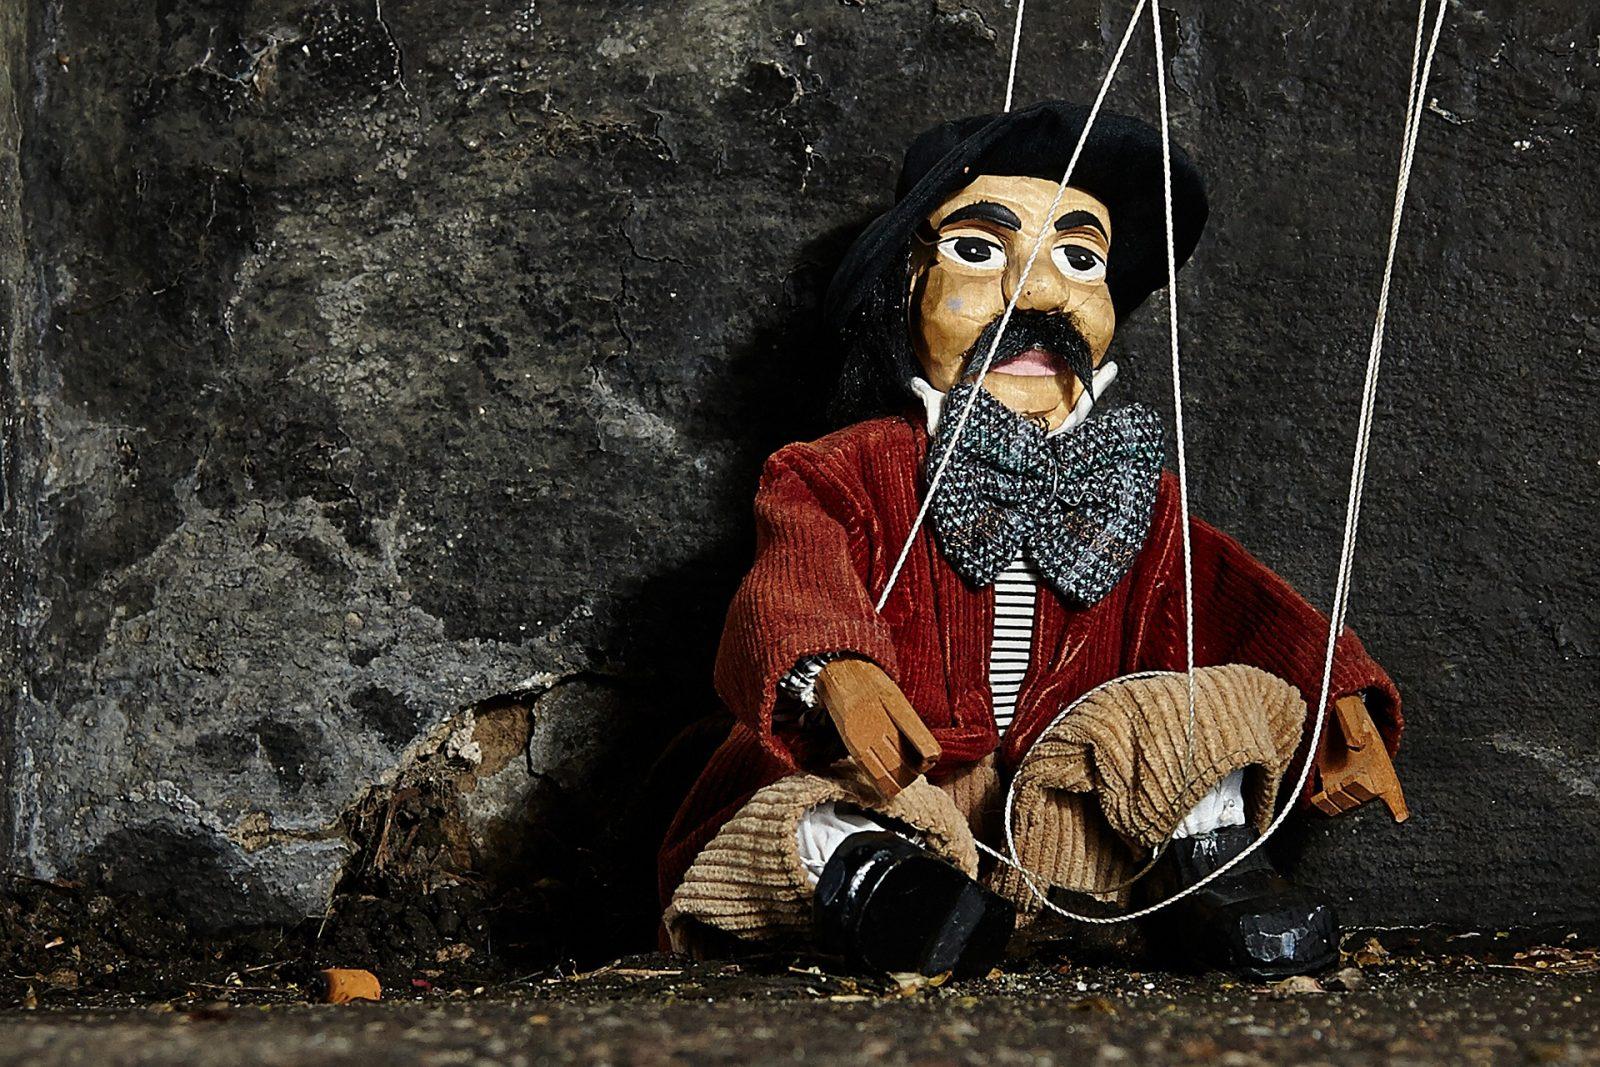 Marionette Museum Cesky Krumlov